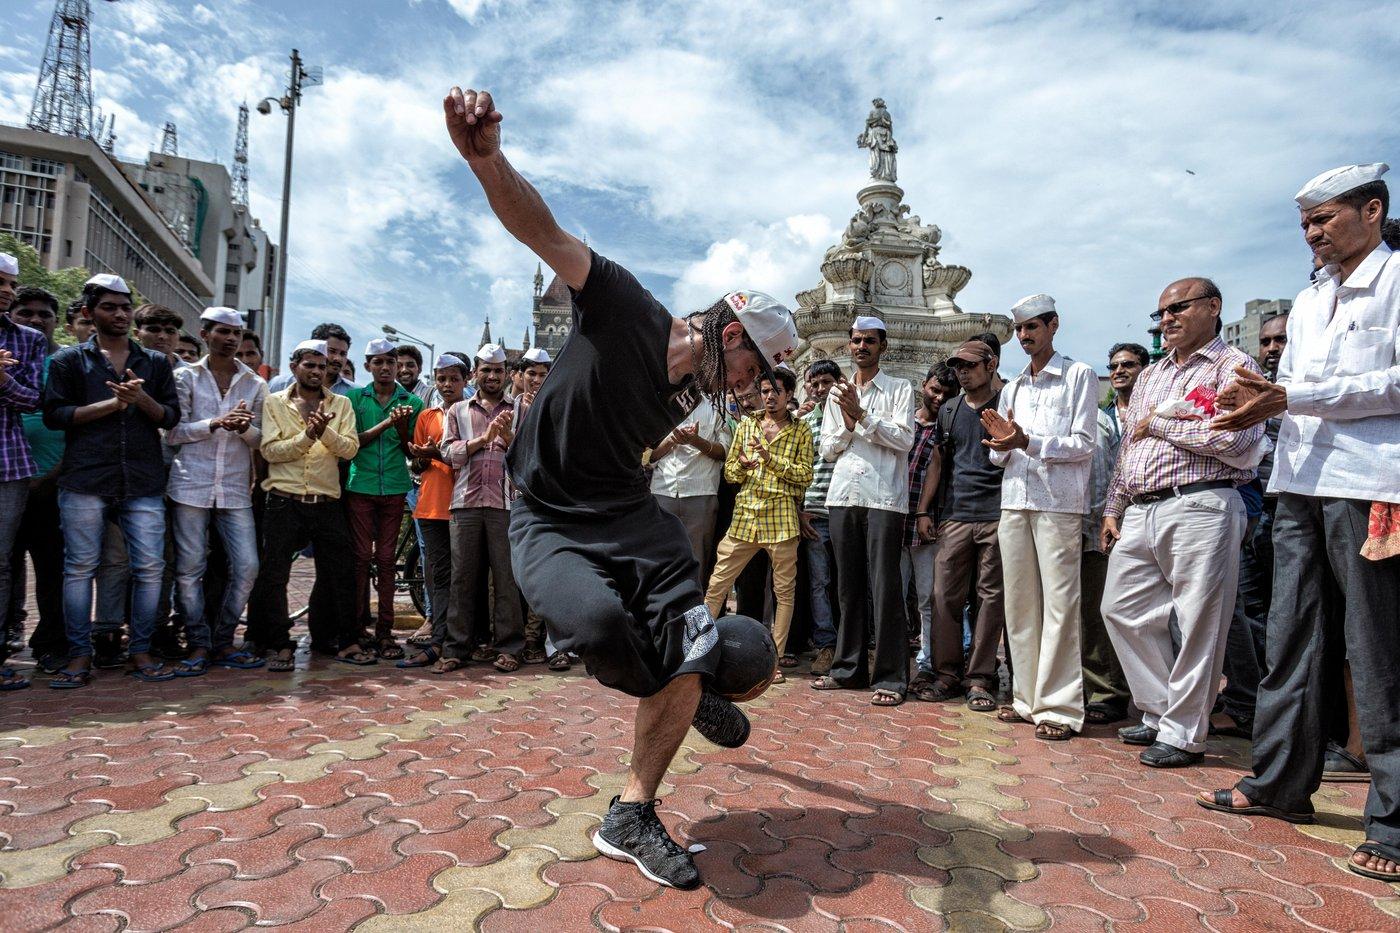 sean-garnier-does-freestyle-soccer-tricks-in-mumbai